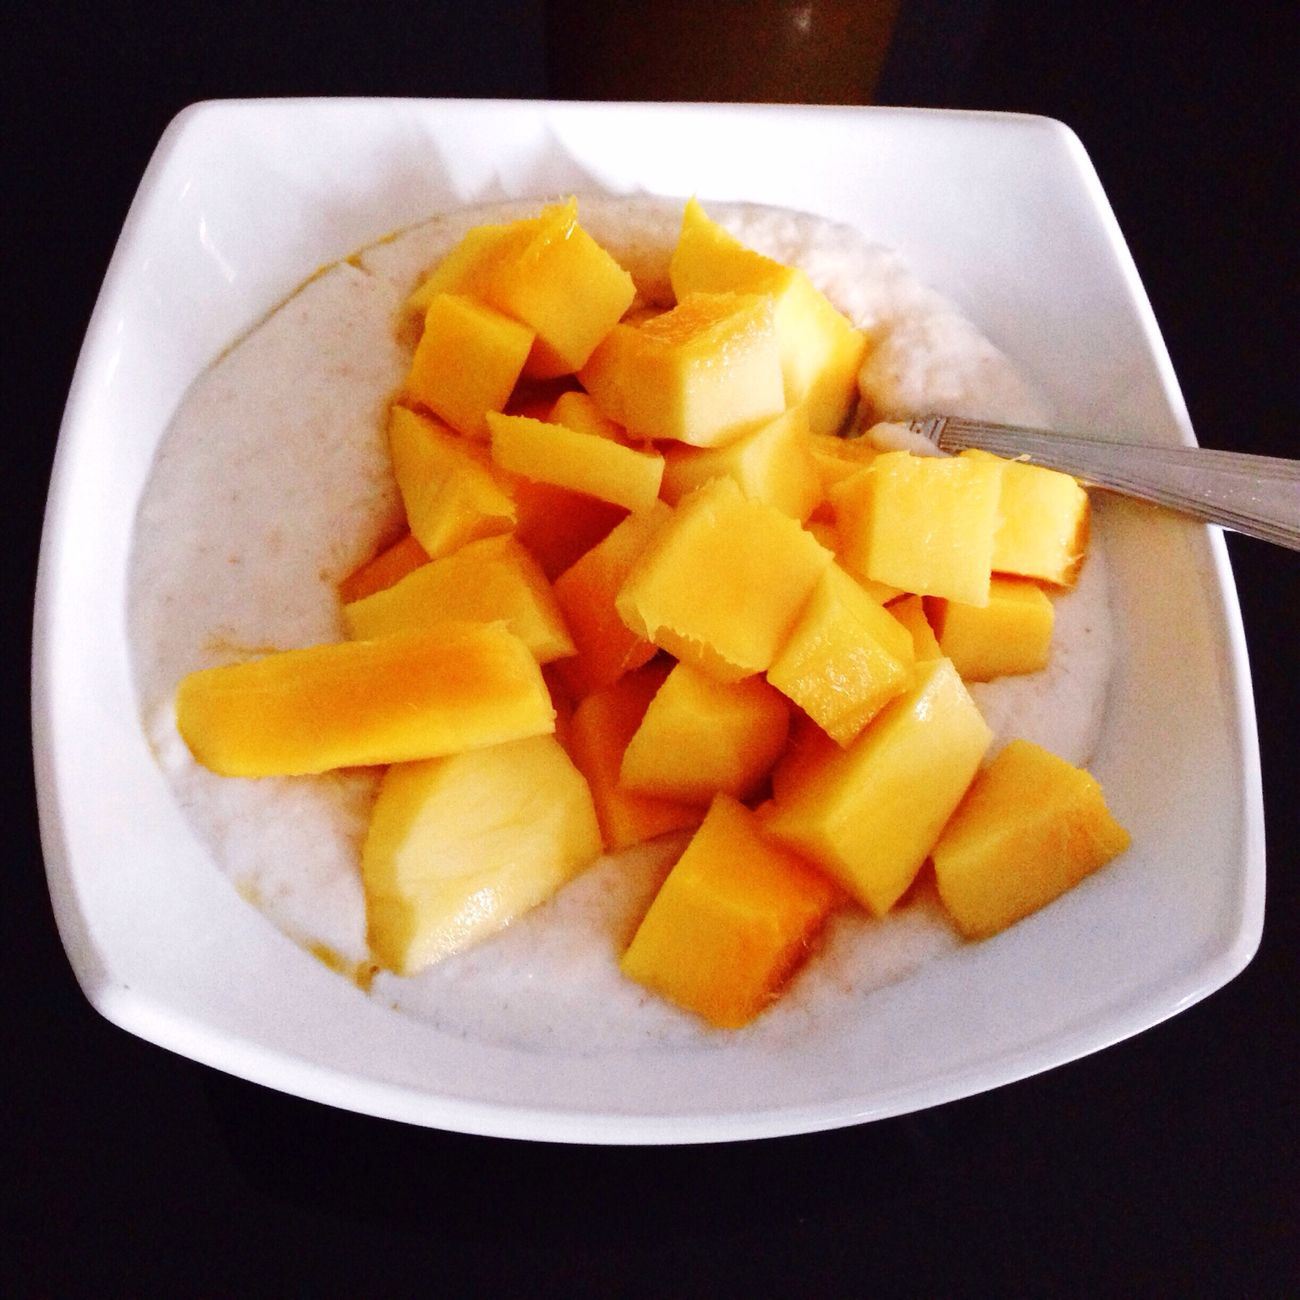 Oatmeal with fresh manggo on top for my b'fast Healthy Lifestyle Healthy Eating Healthy Food Jakarta Indonesia INDONESIA Oatmeal Enjoying Life Hello World Breakfast ♥ Breakfast Time Juanesmoriz